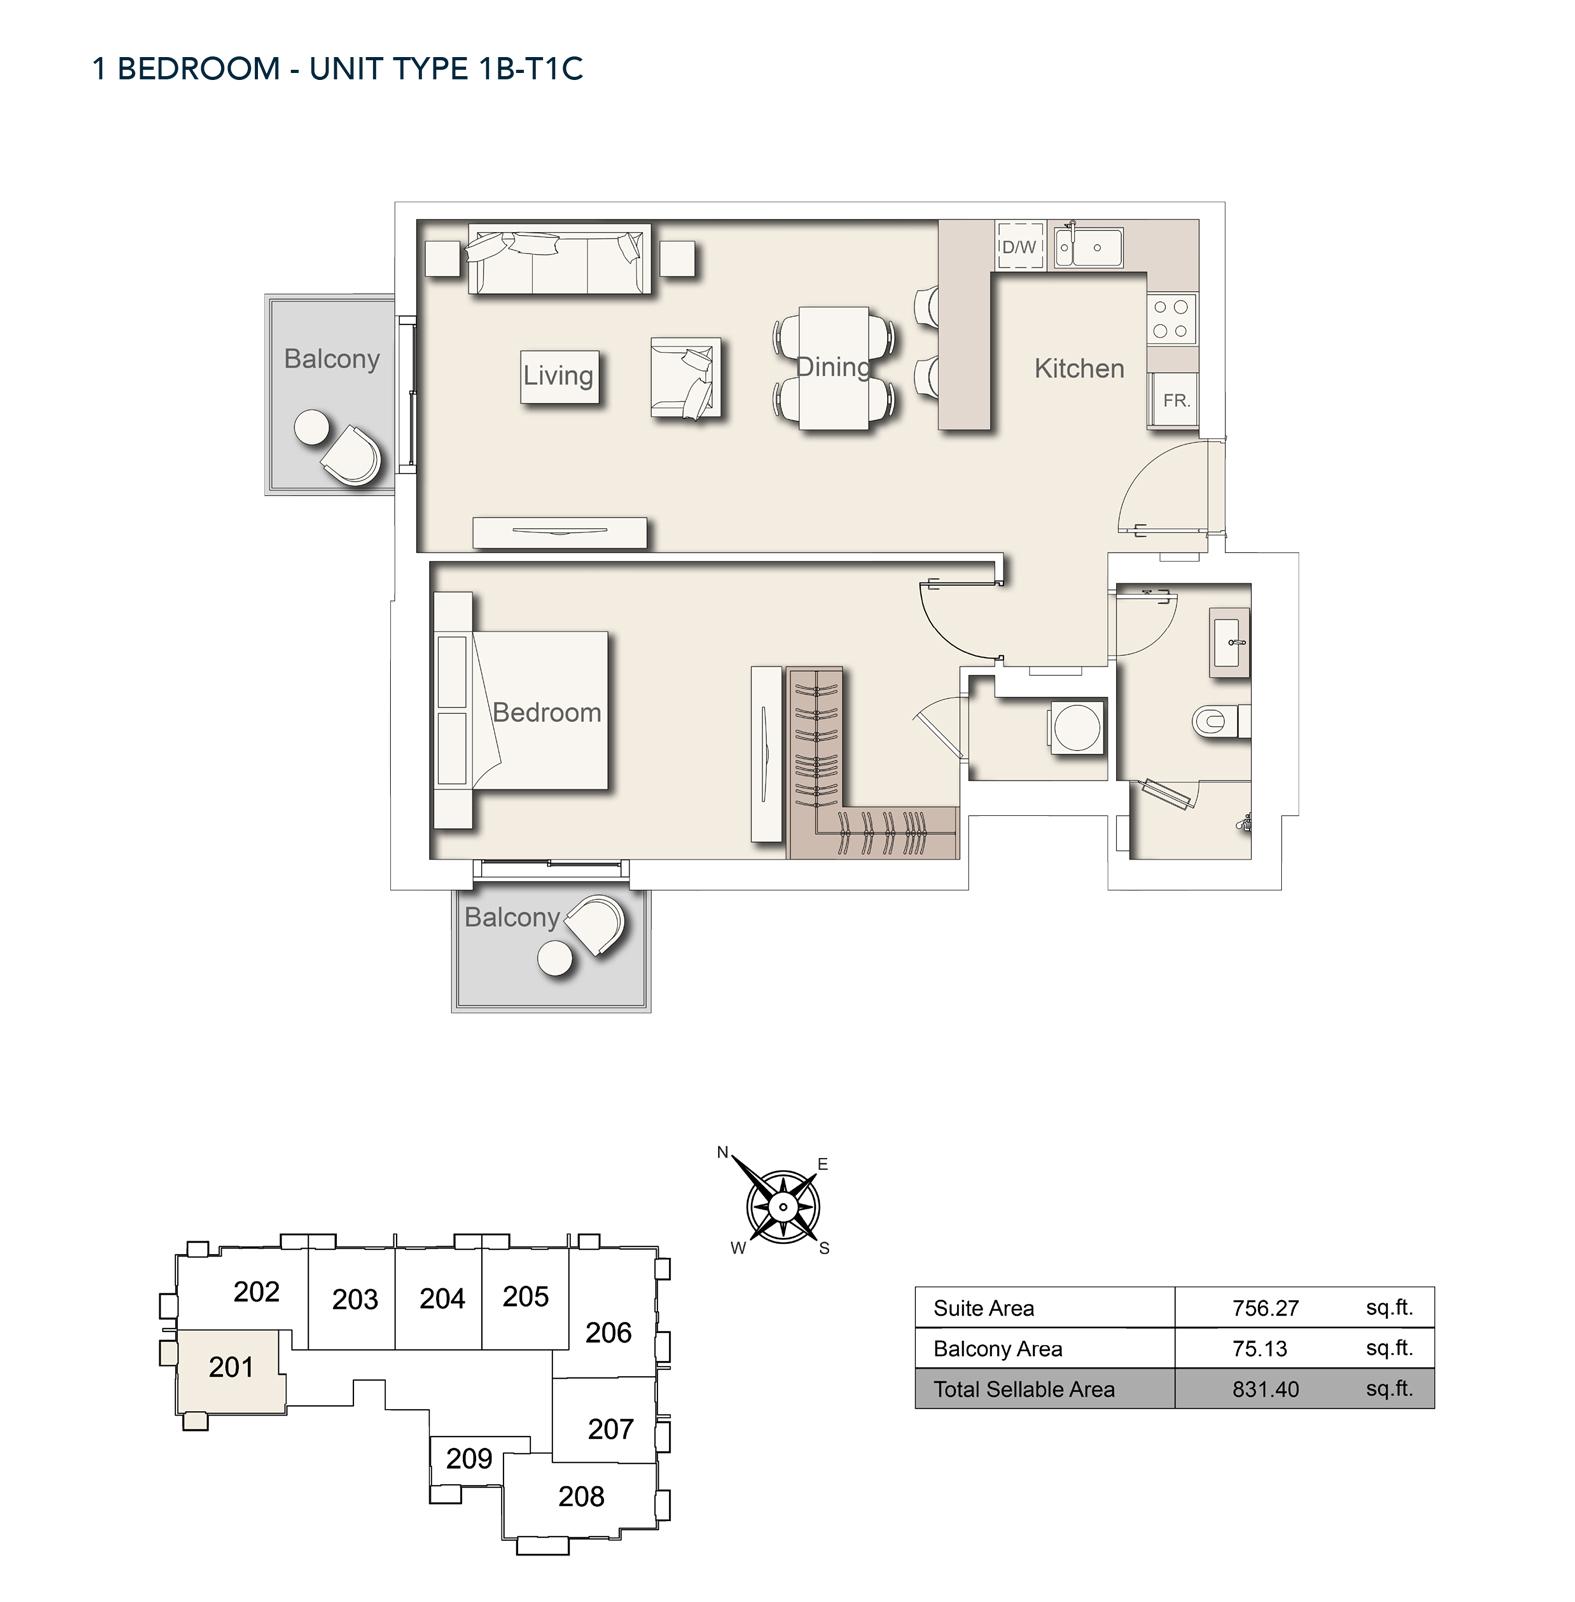 1bedroom-unittype-1b-t1c